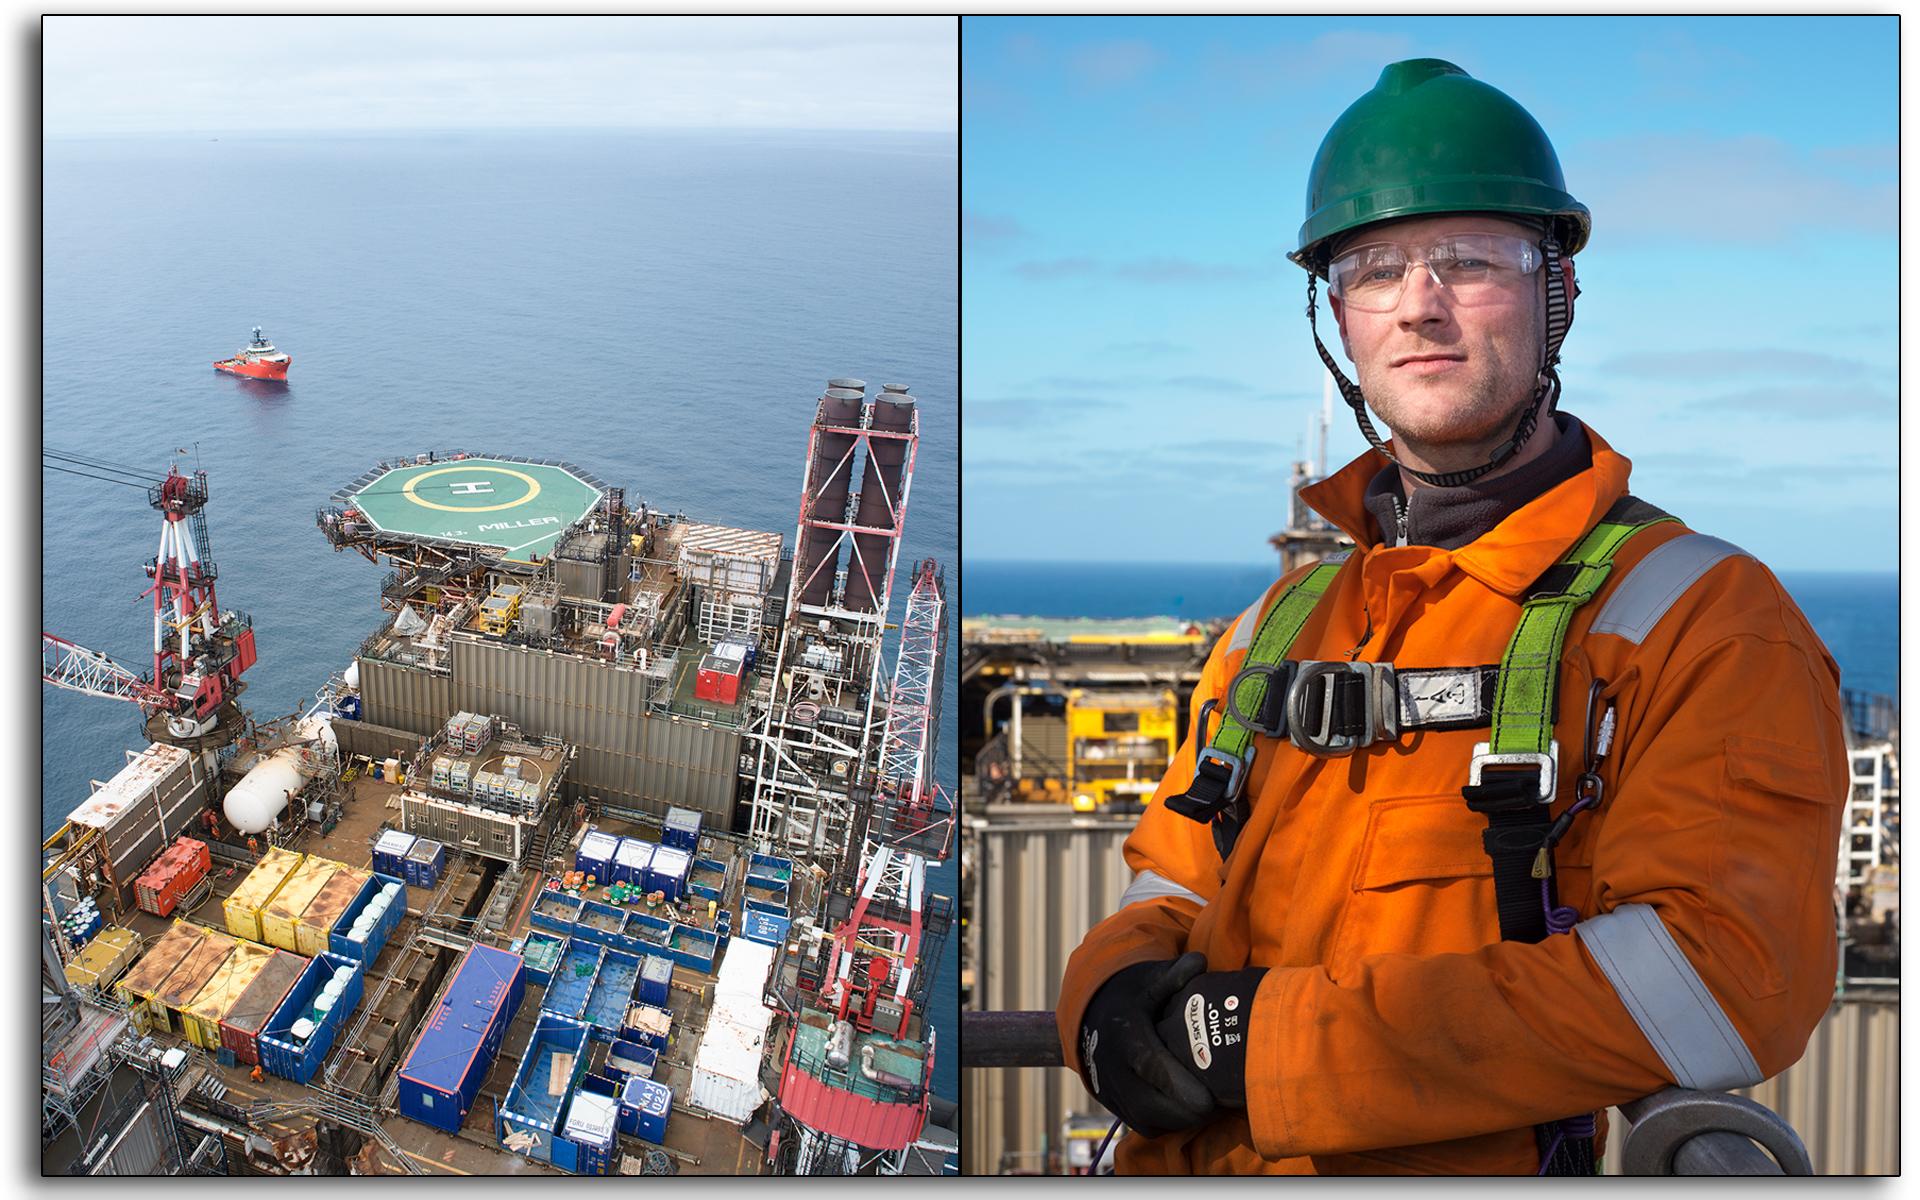 Scaffodler, Mark Wilson, Marc Wilson, Brand energy, ACN, oil and gas industry, portrait, portrature, selfie, BP Miller, oil and gas rig, Petrofac, BP.jpg